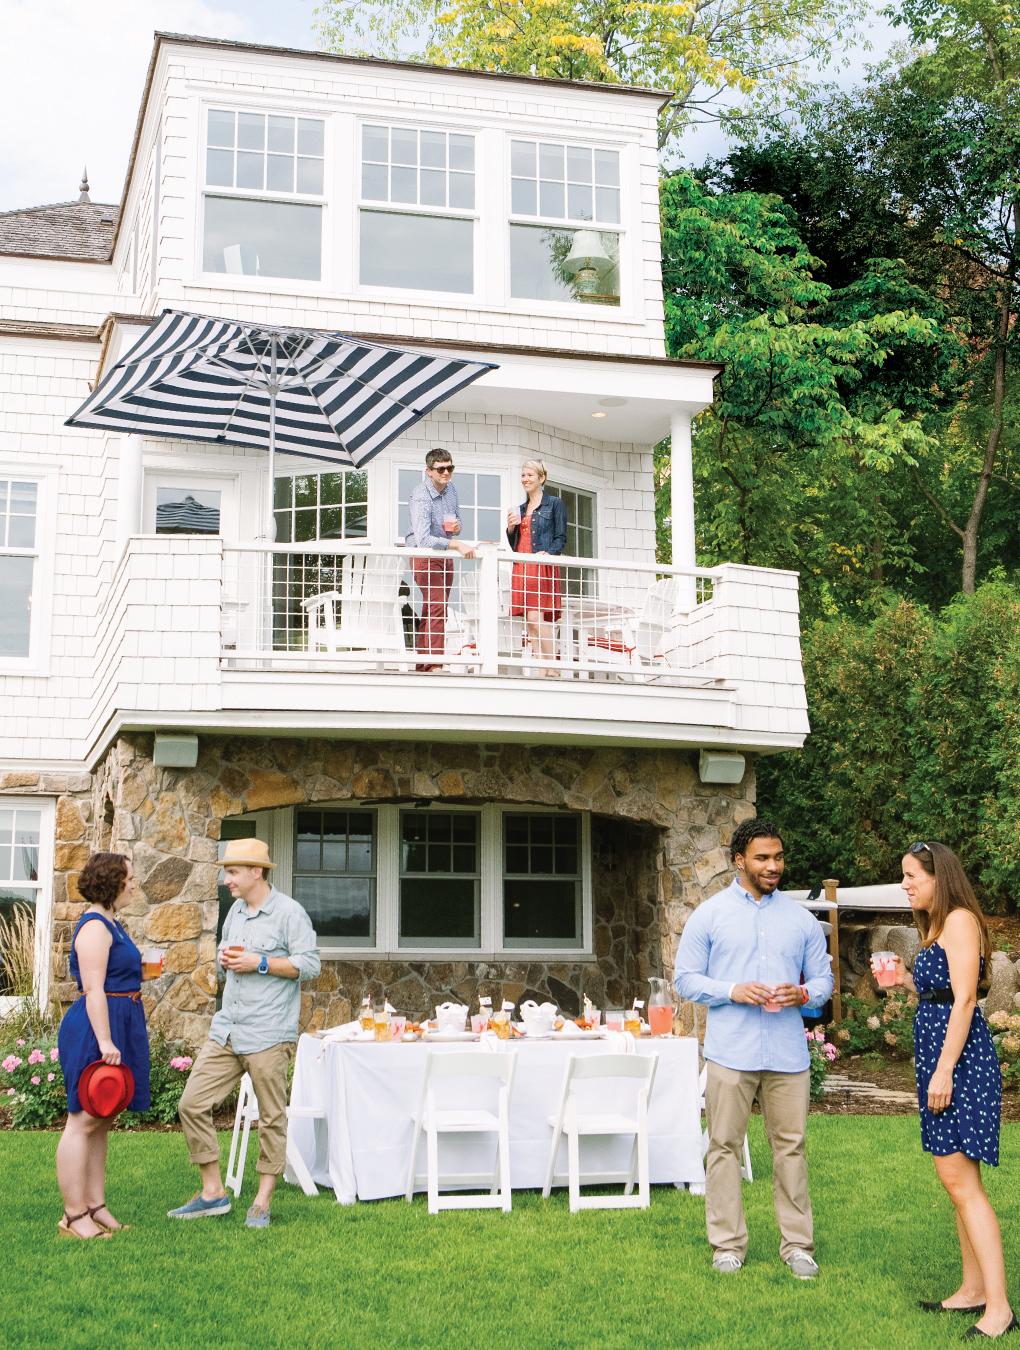 Crawfish-Feast_Outdoor-Summer-Entertaining-Home-Exterior